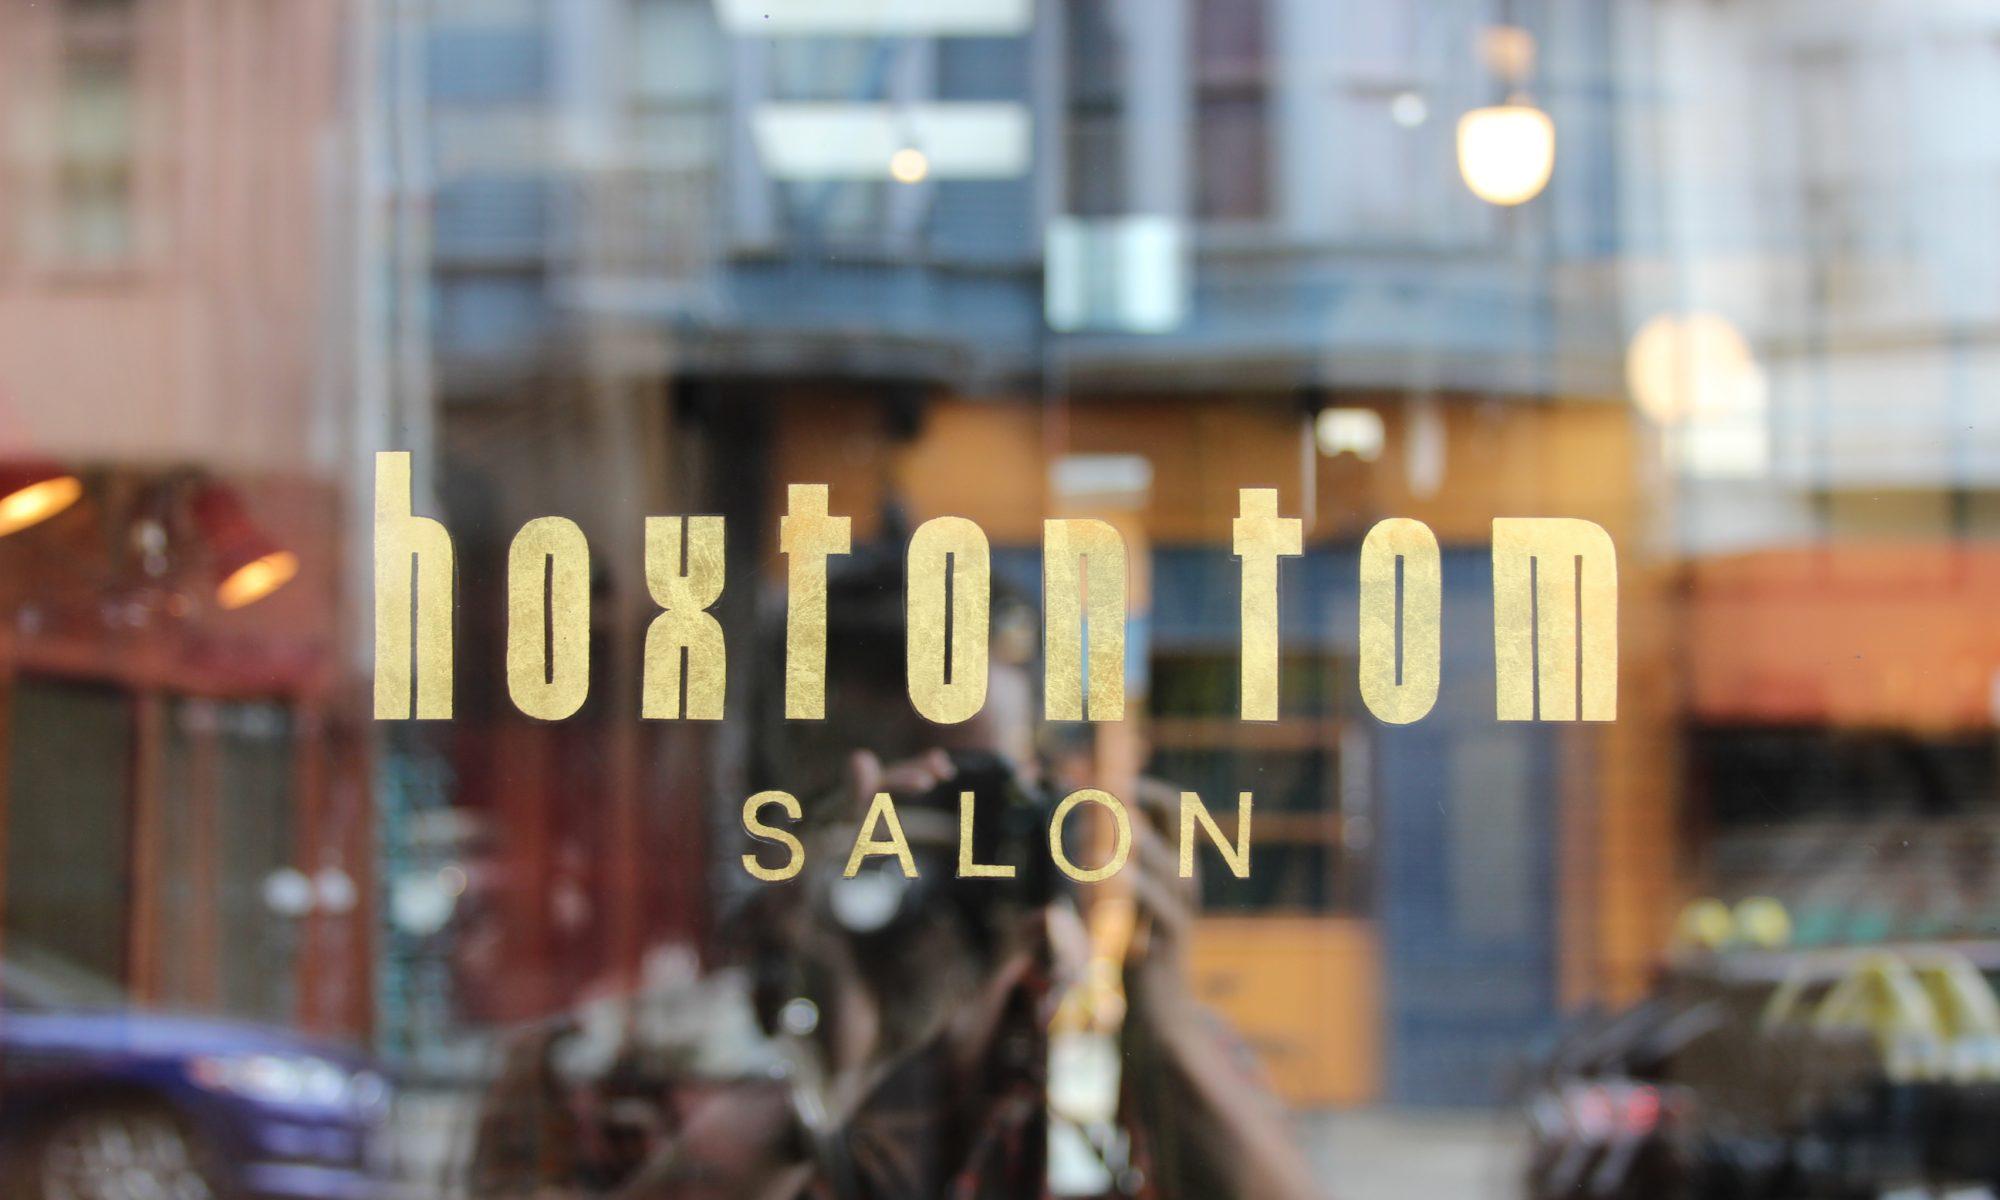 HoxtonTom Salon